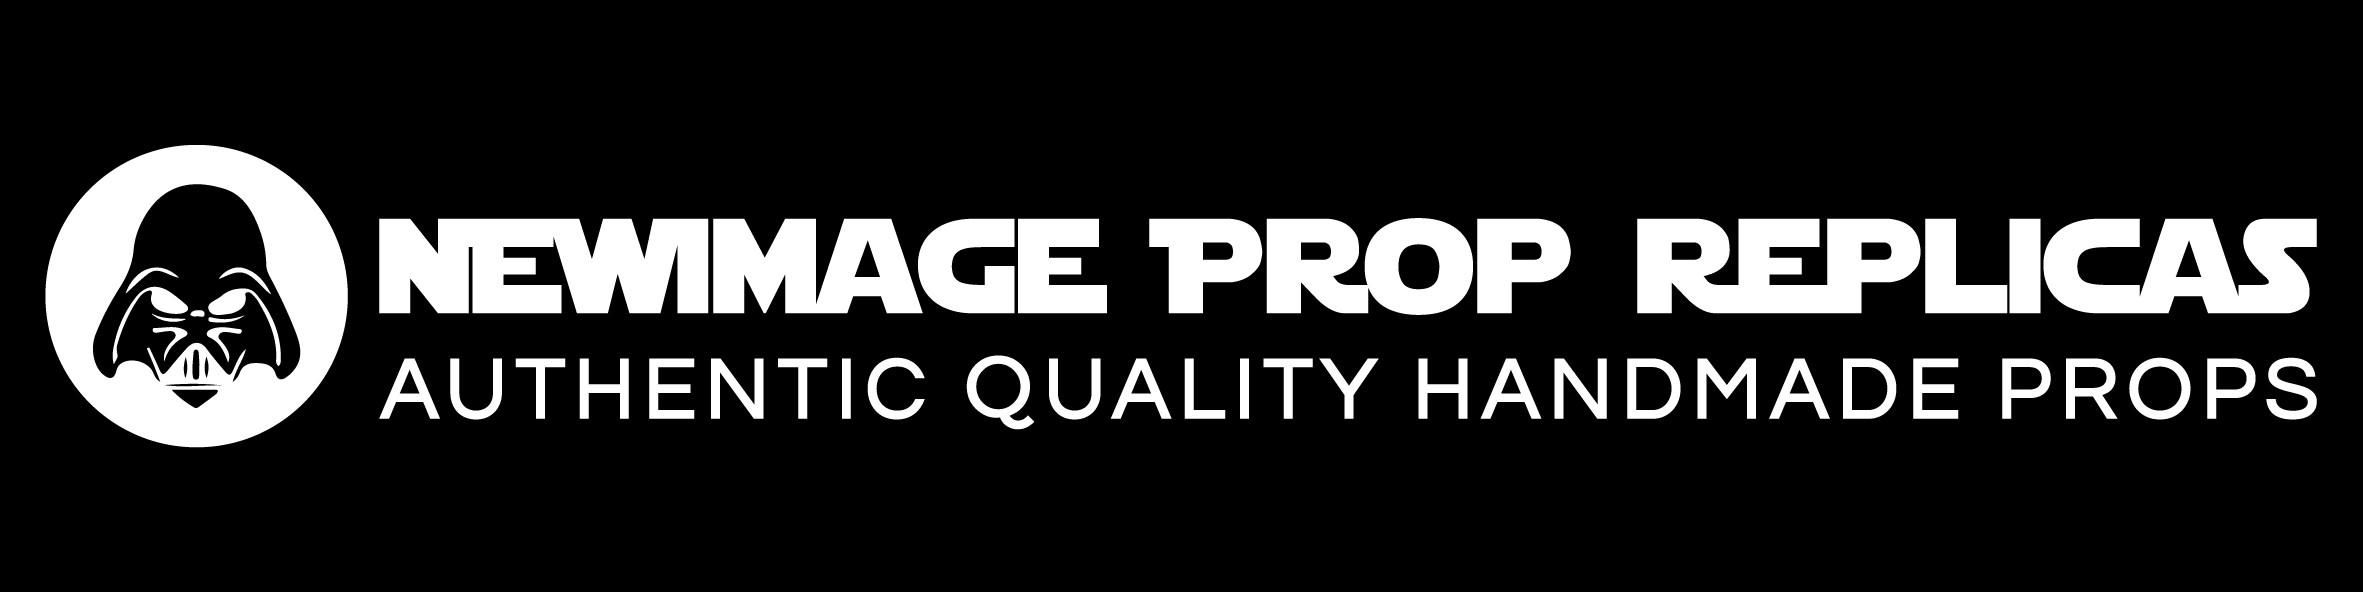 www.newimage-prop-replicas.co.uk